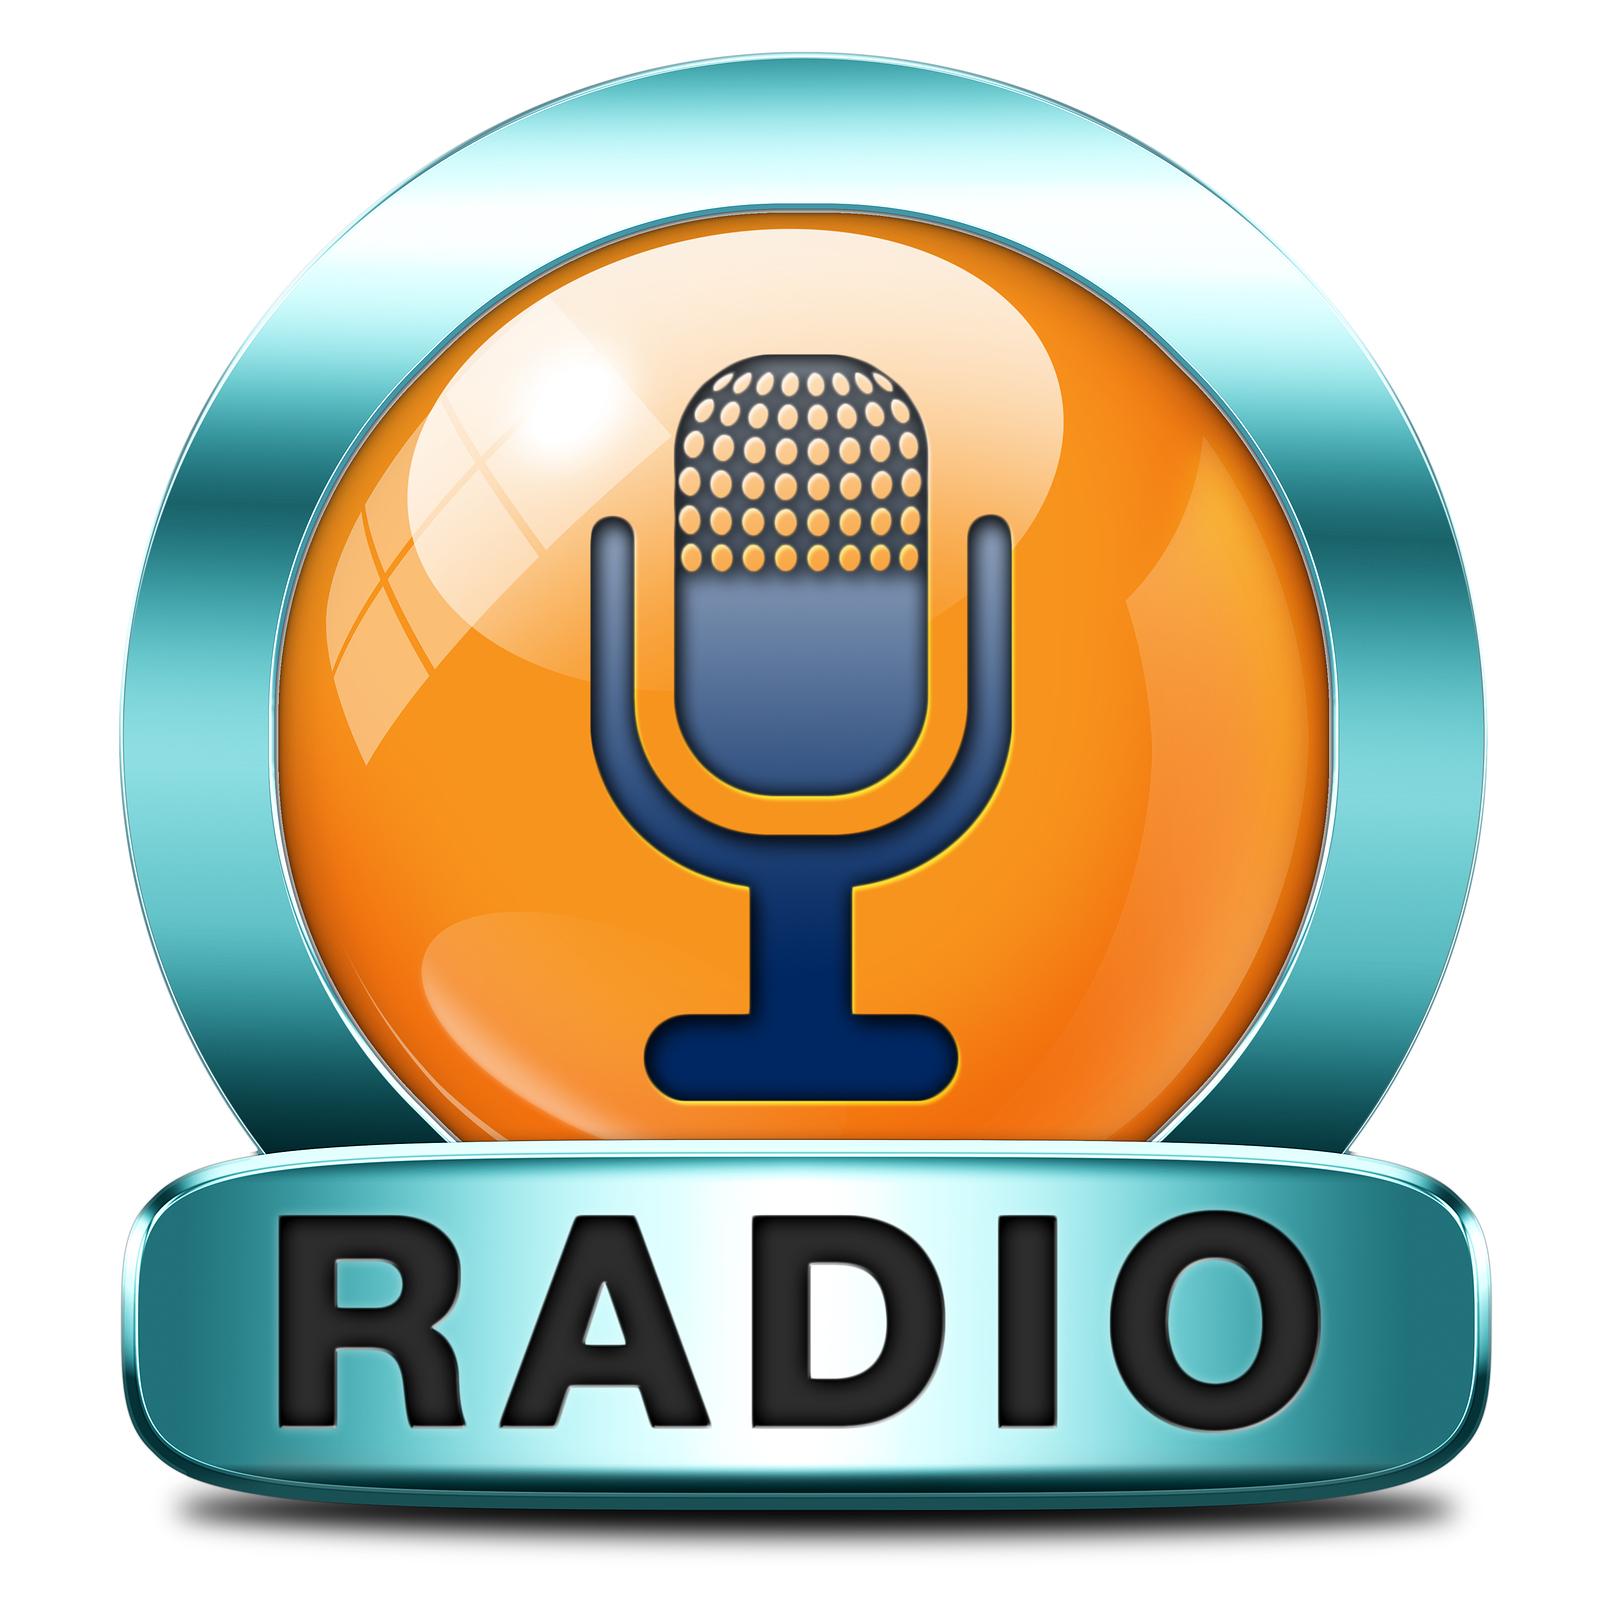 wprjx radio station